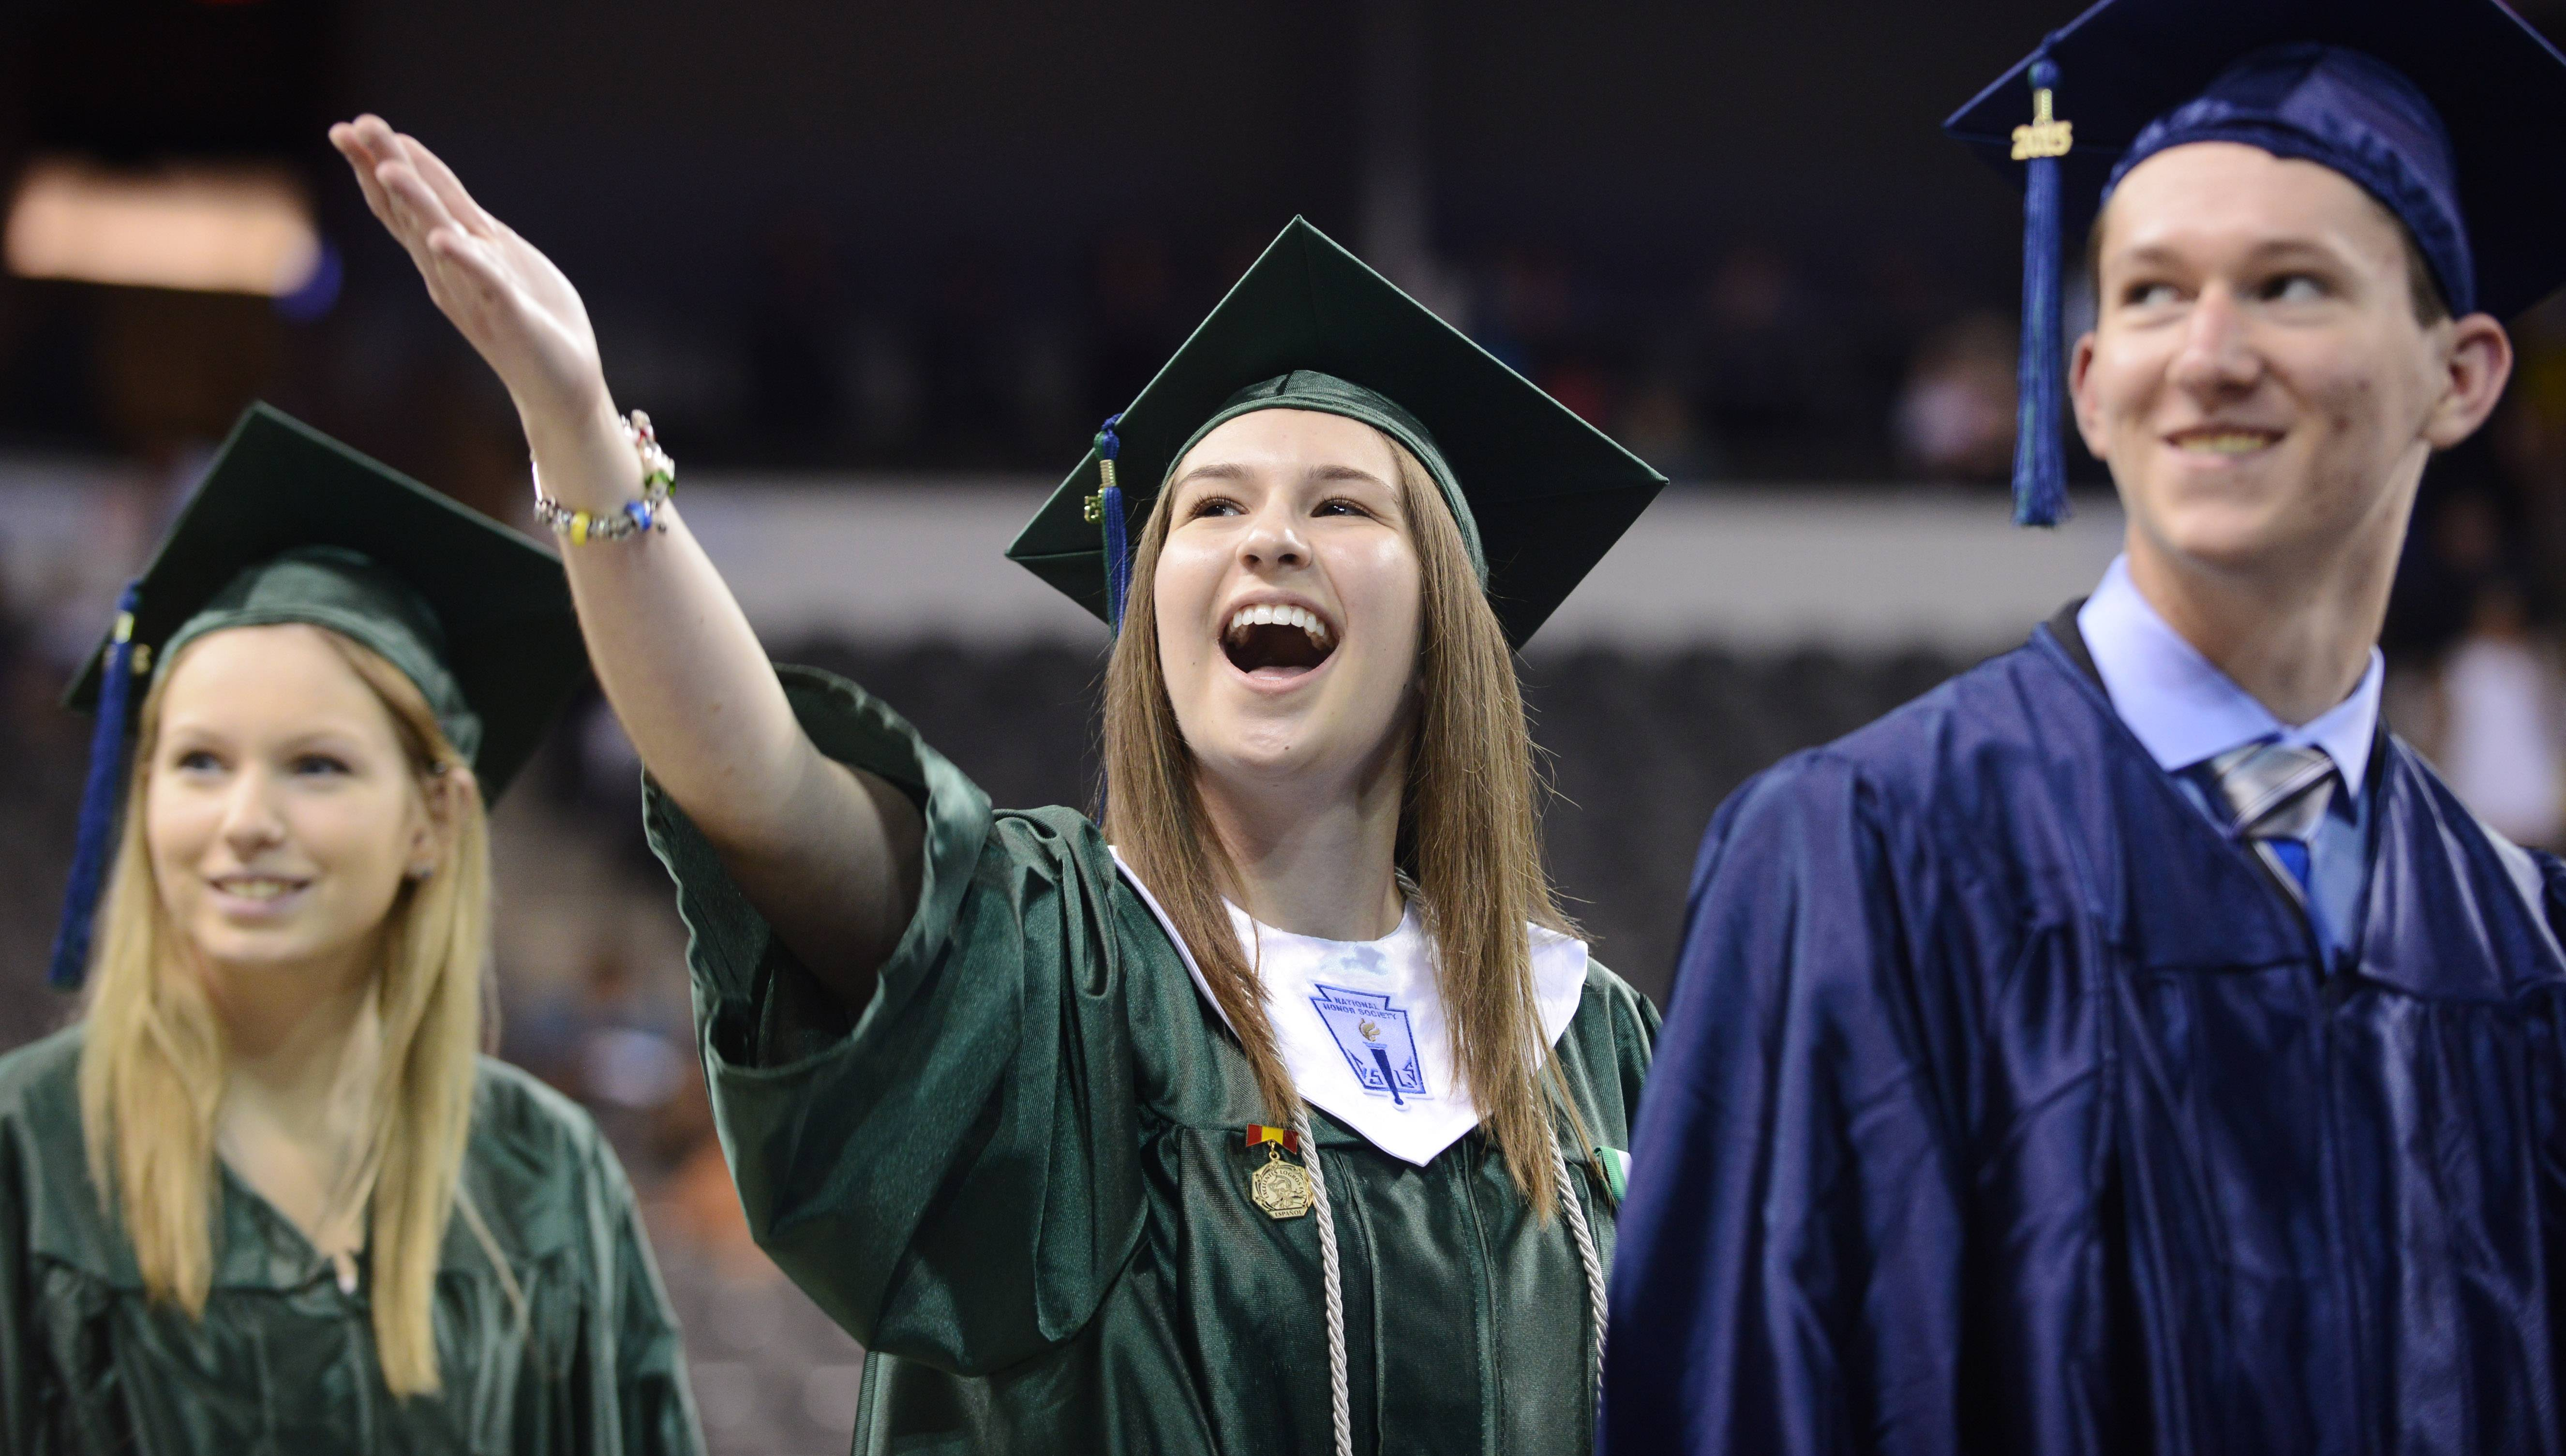 Images: Bartlett High School graduation